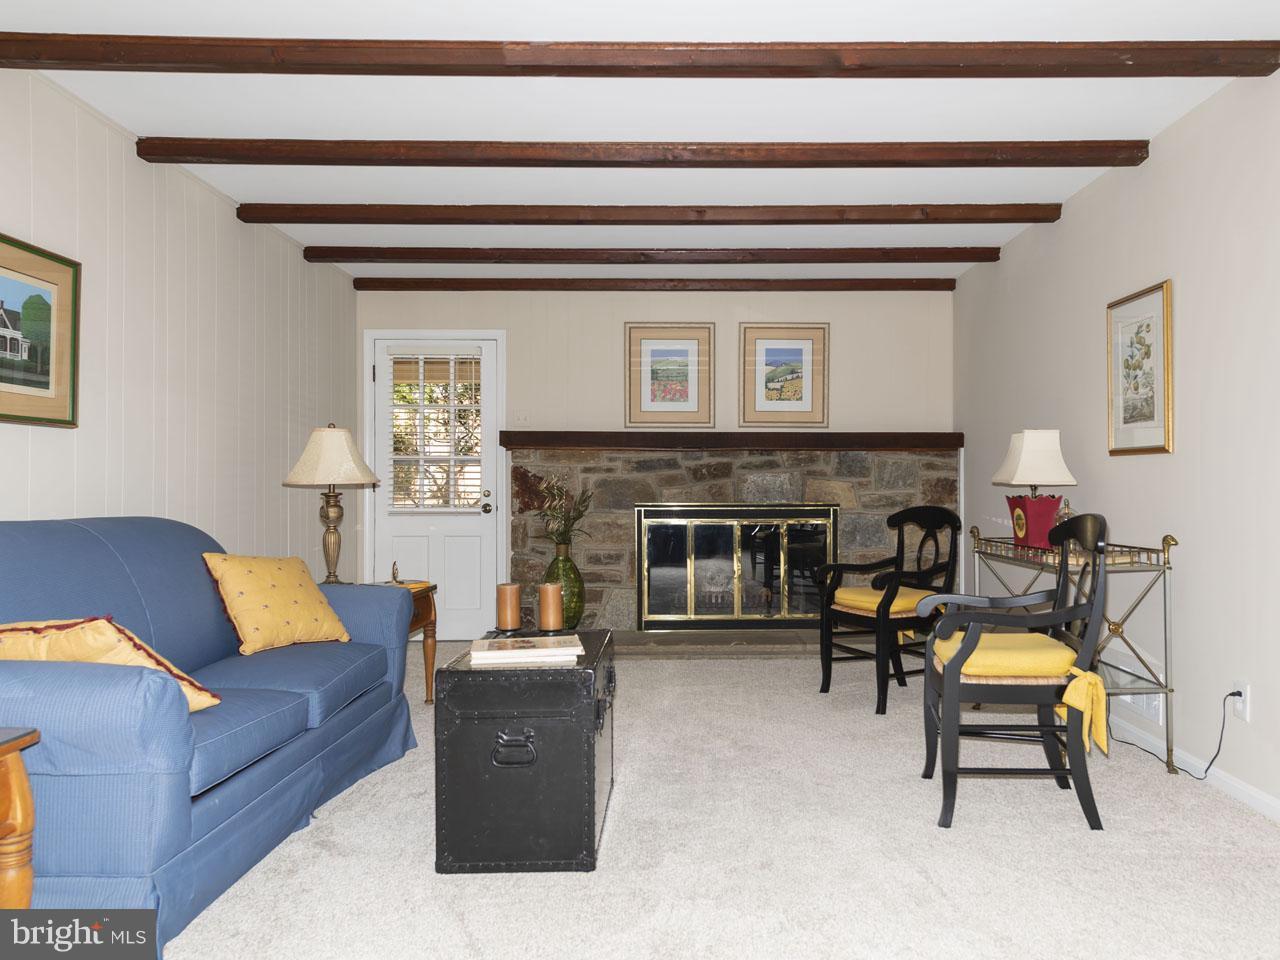 1010014728-300953036160-2021-09-05-13-50-26  |   | Annandale Delaware Real Estate For Sale | MLS# 1010014728  - Best of Northern Virginia